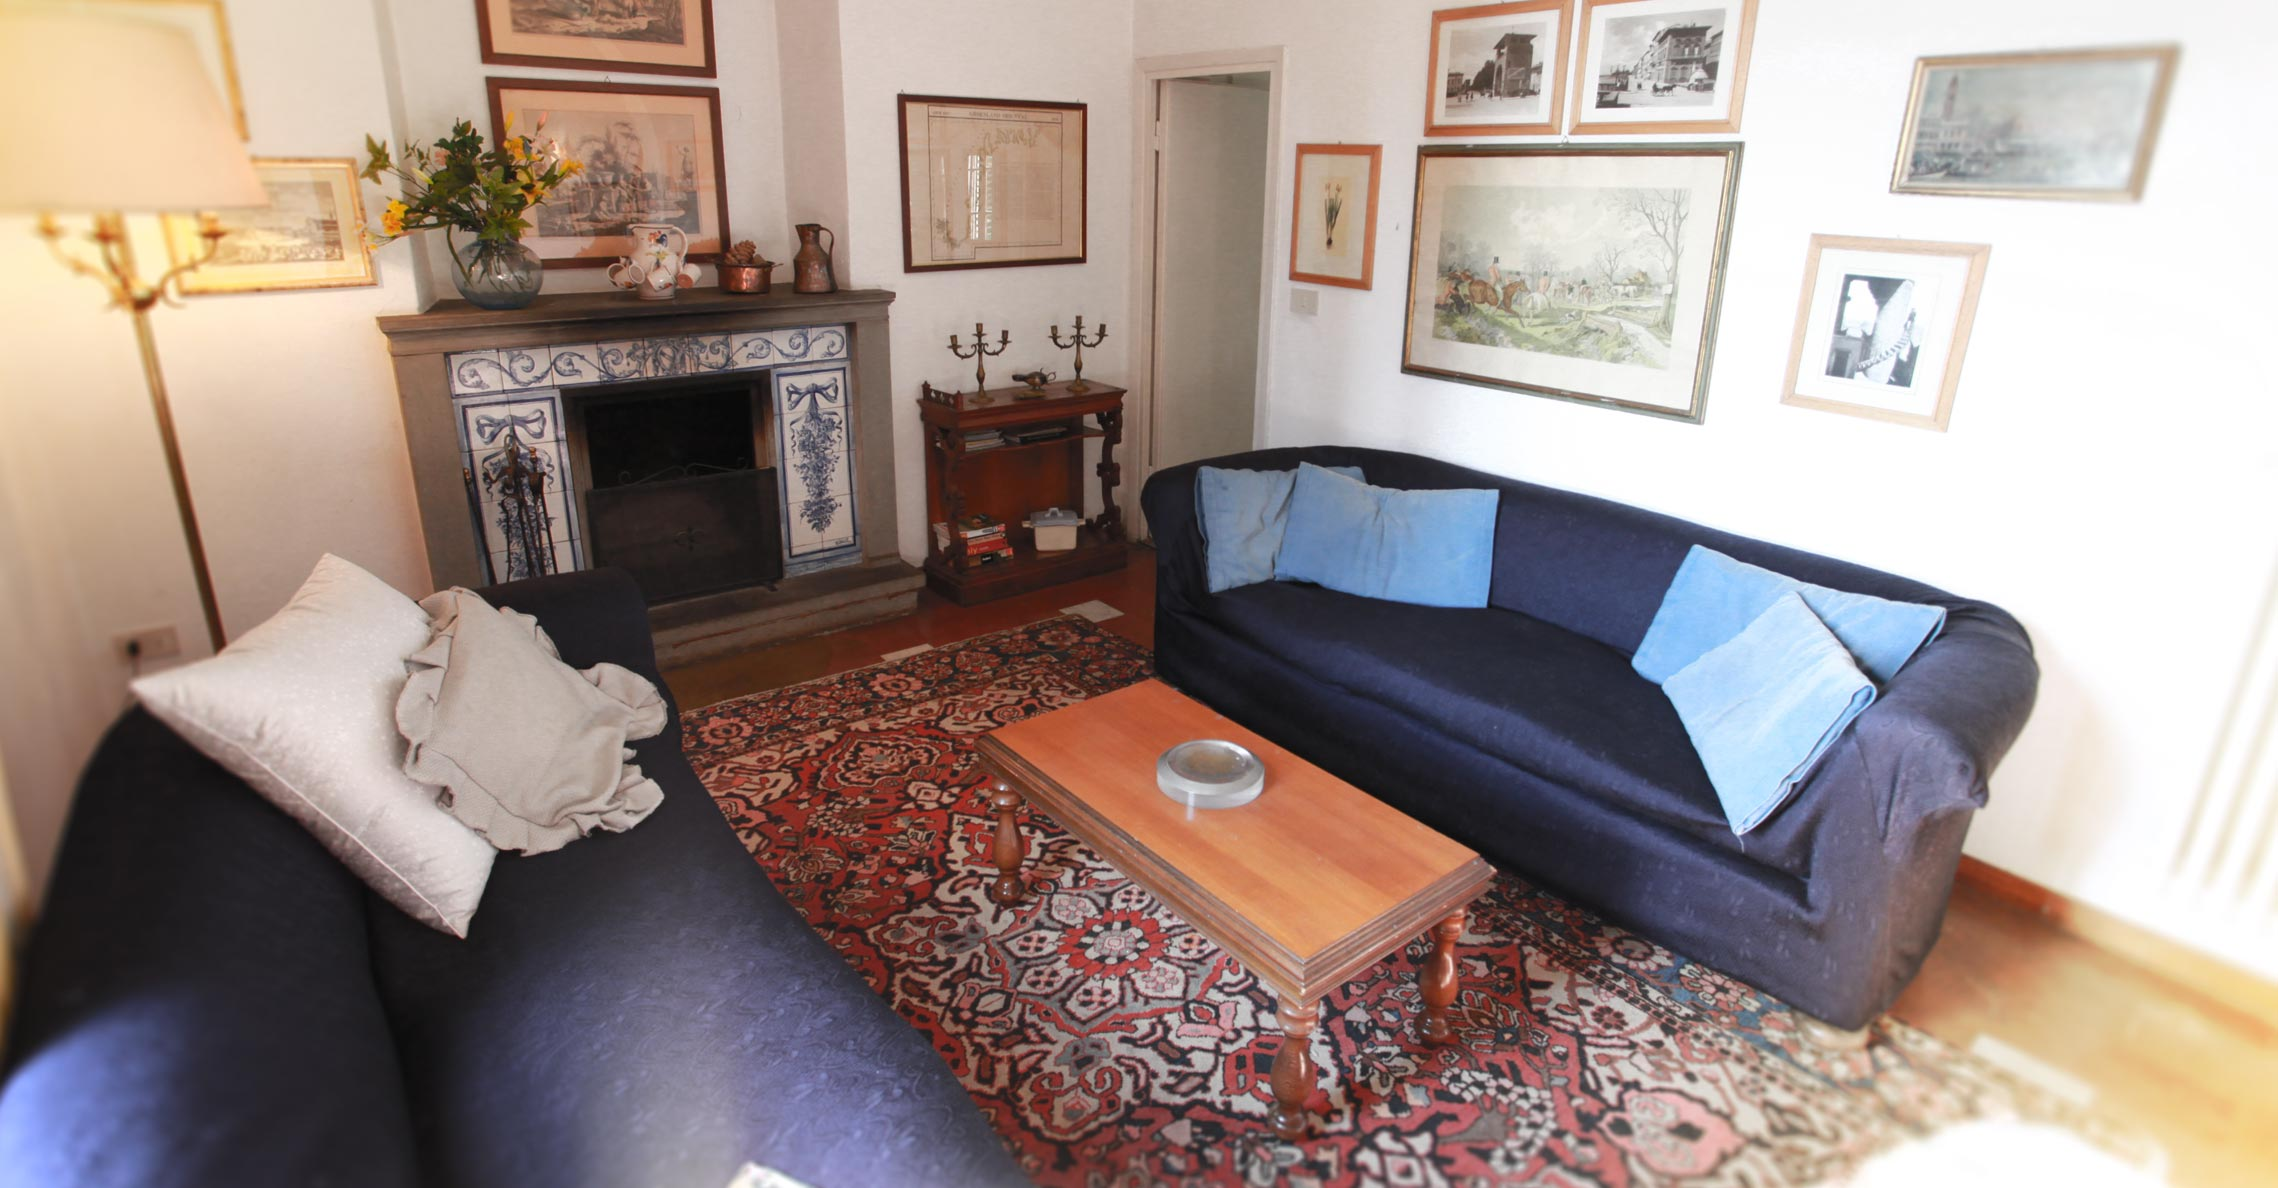 acacia_interior_fireplace